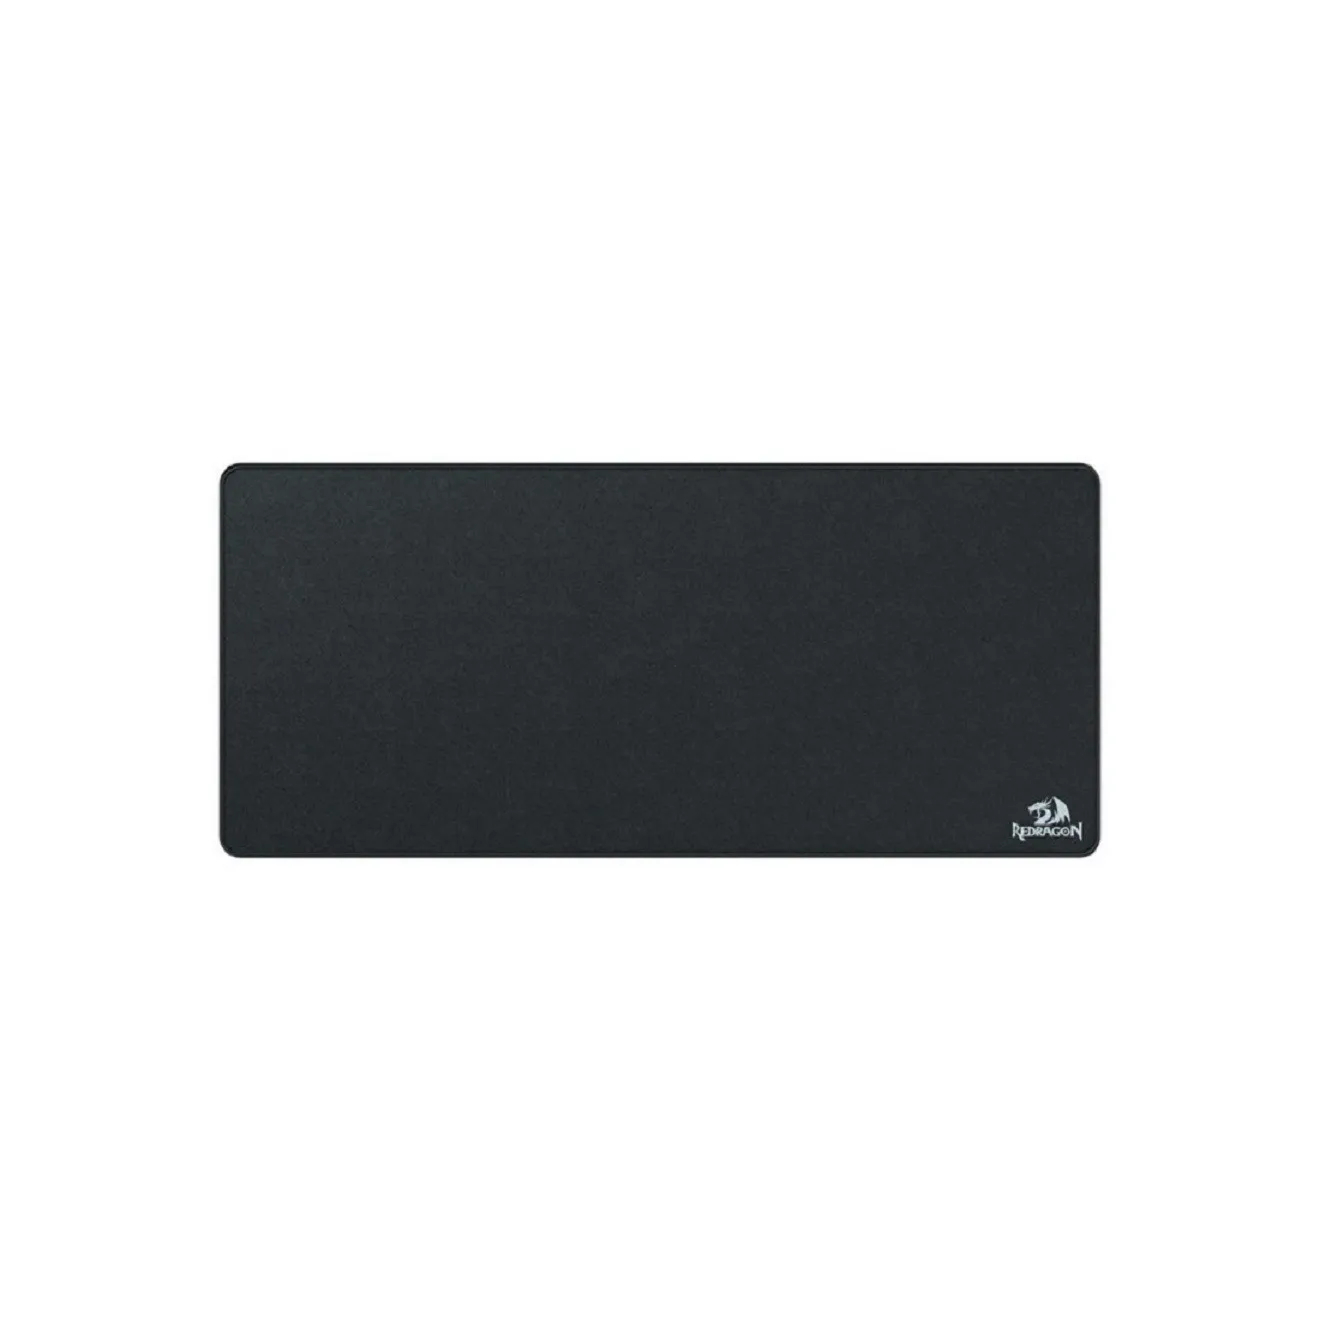 Mouse Pad Redragon Flick XL P032 900x400x4mm